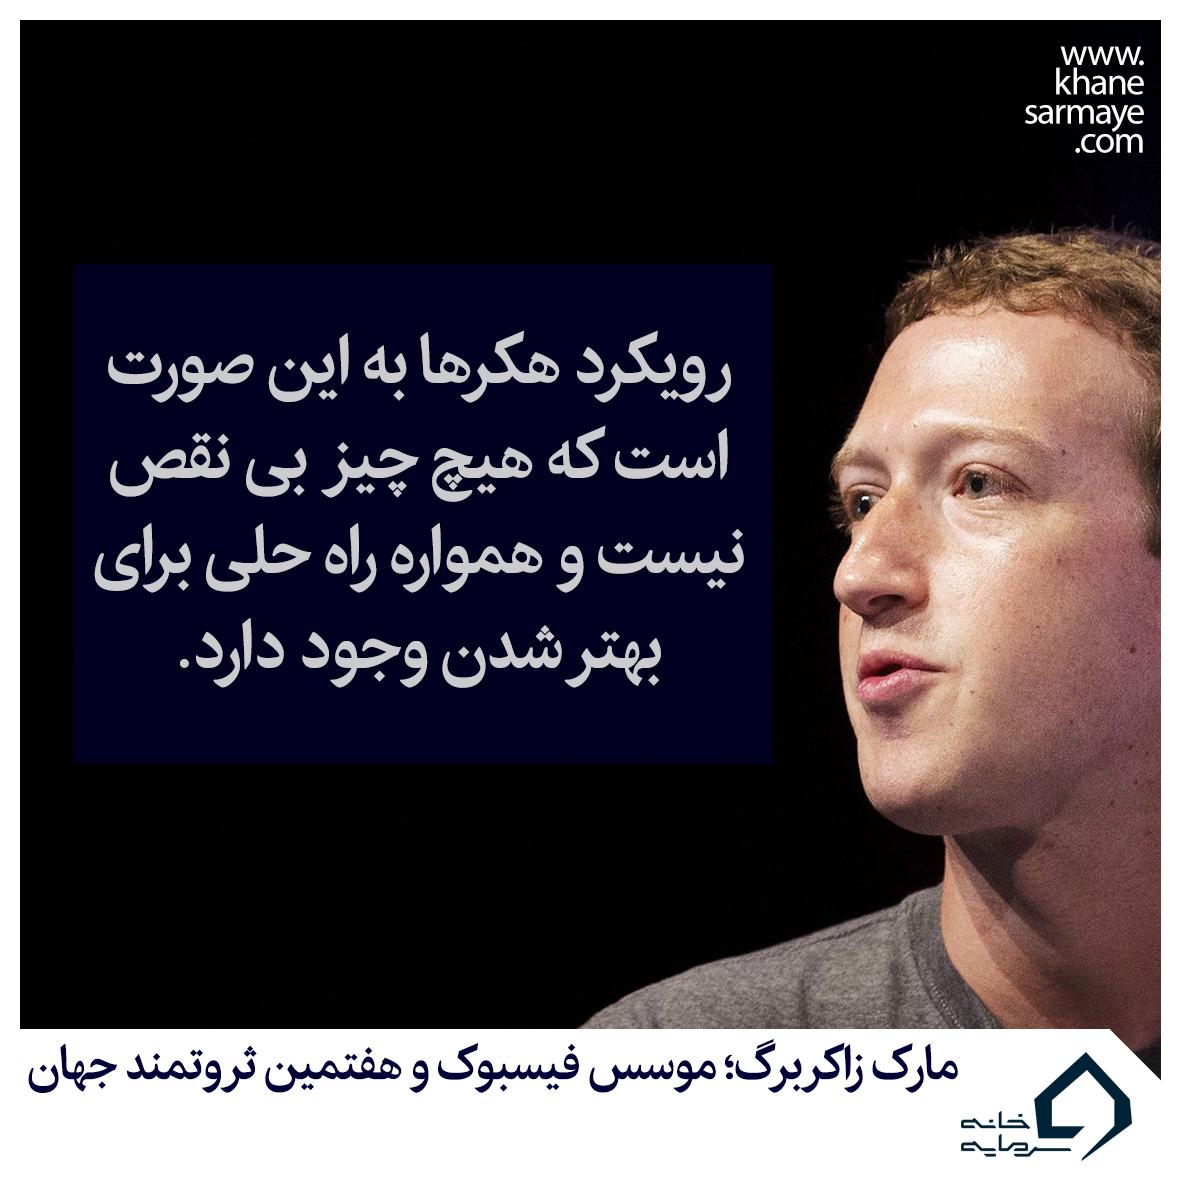 7 توصیه الهام بخش مارک زاکربرگ موسس فیسبوک